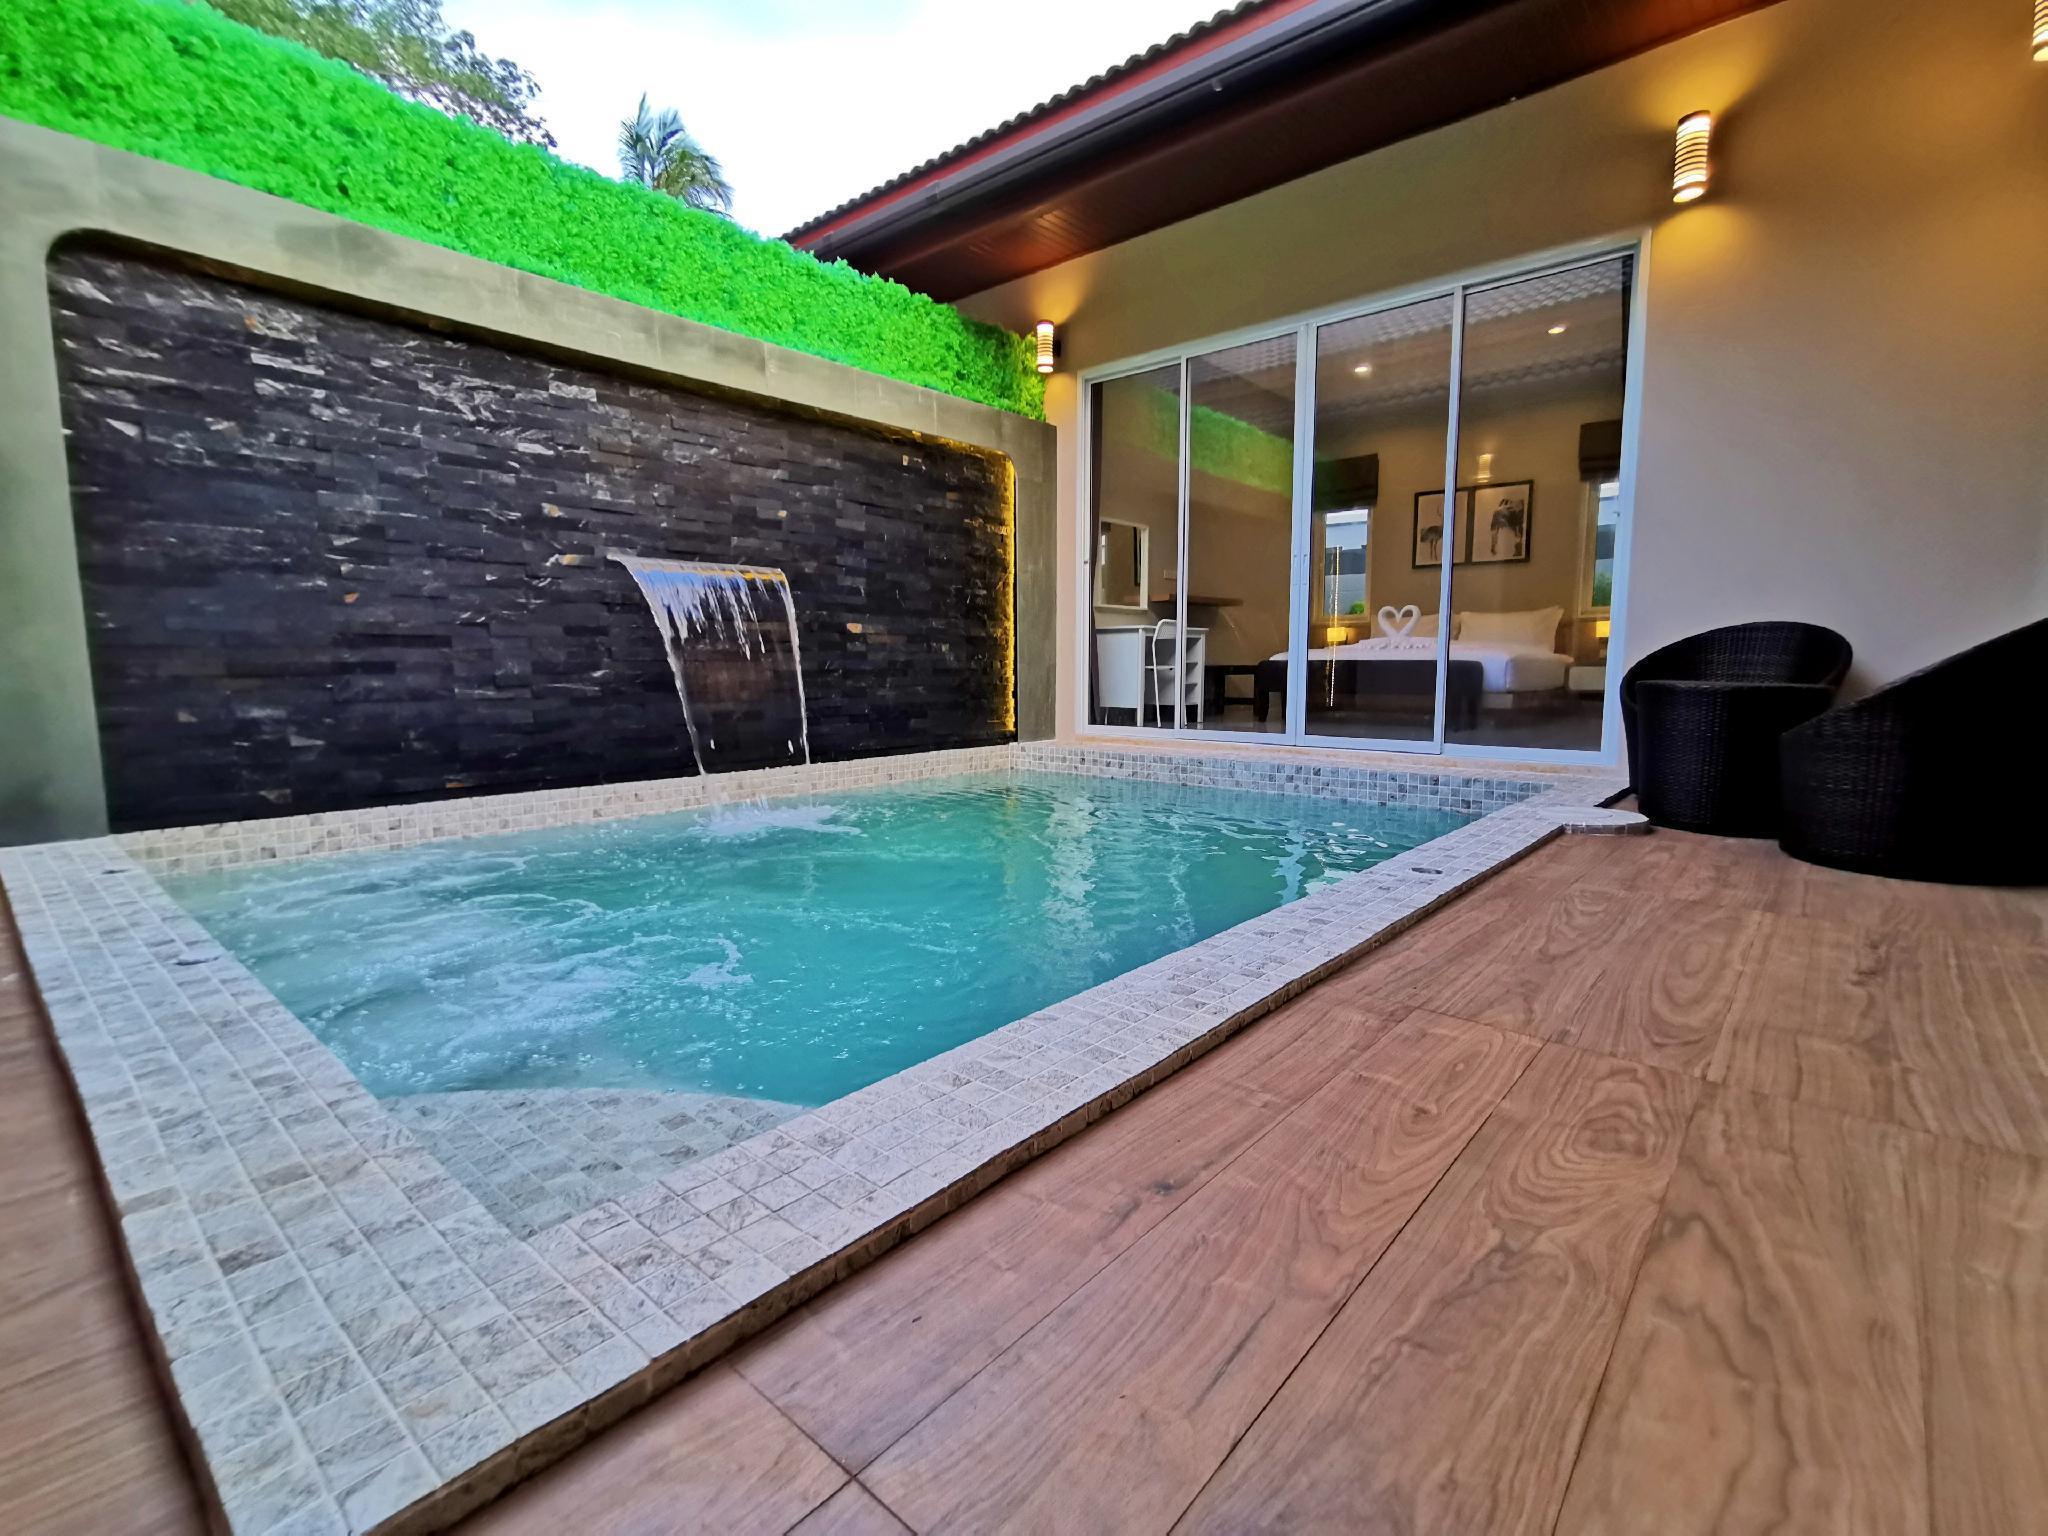 The Apex private pool villa Krabi วิลลา 2 ห้องนอน 2 ห้องน้ำส่วนตัว ขนาด 60 ตร.ม. – บ้านทรายไทย